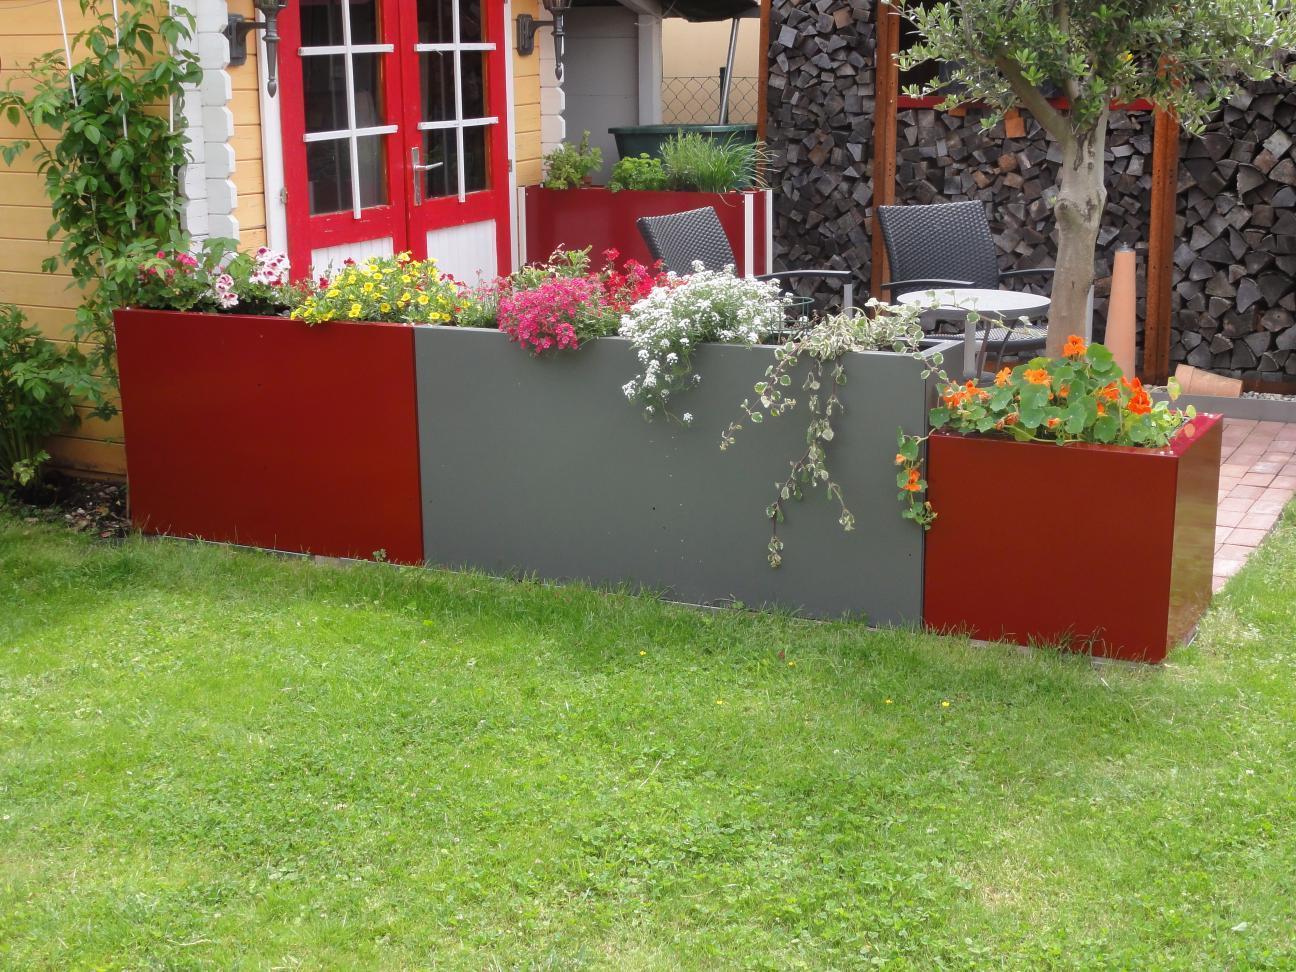 hochbeet urban aus metall 1 5 m x 1 1 m x 0 9 m beschichtet. Black Bedroom Furniture Sets. Home Design Ideas